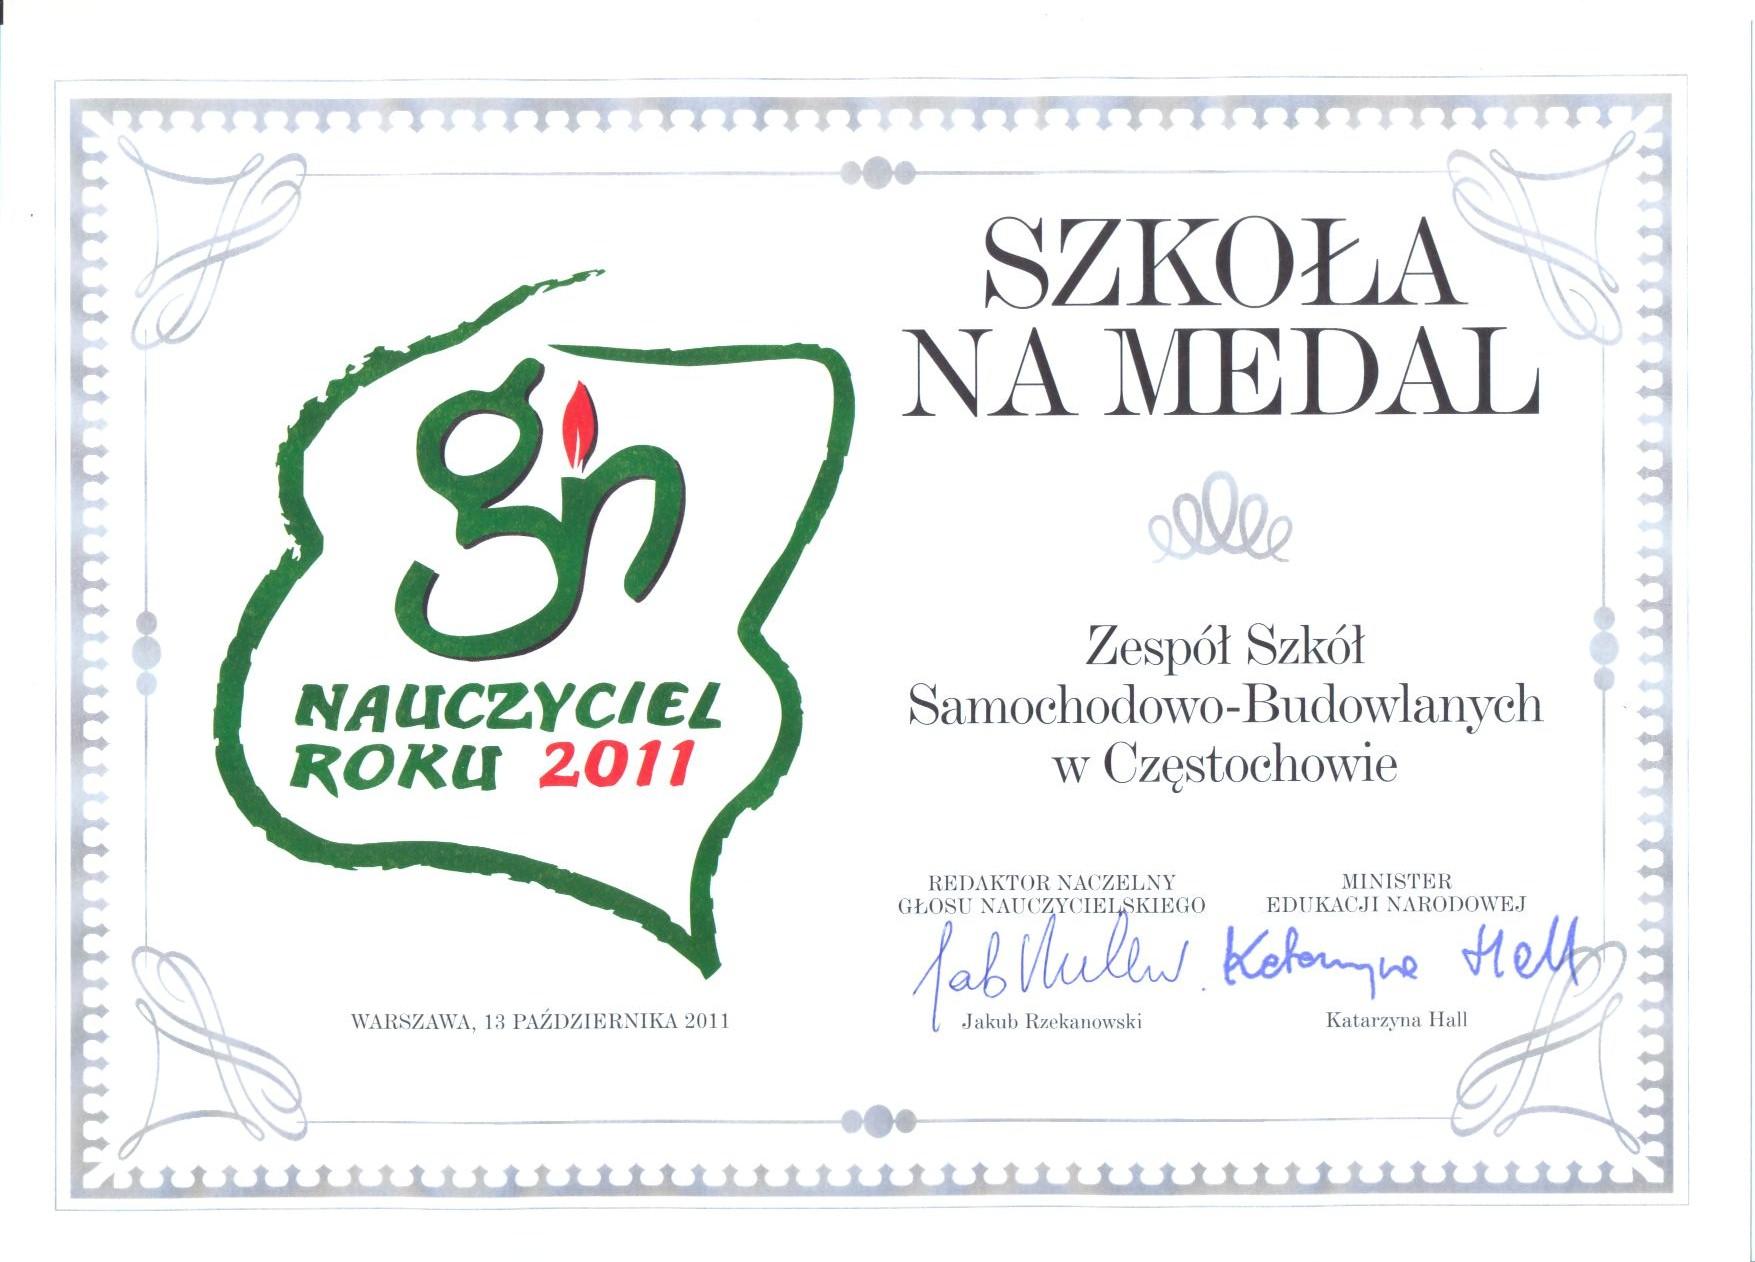 http://www.zssb.czest.szkolnastrona.pl/index.php?p=sd&id=29&action=show